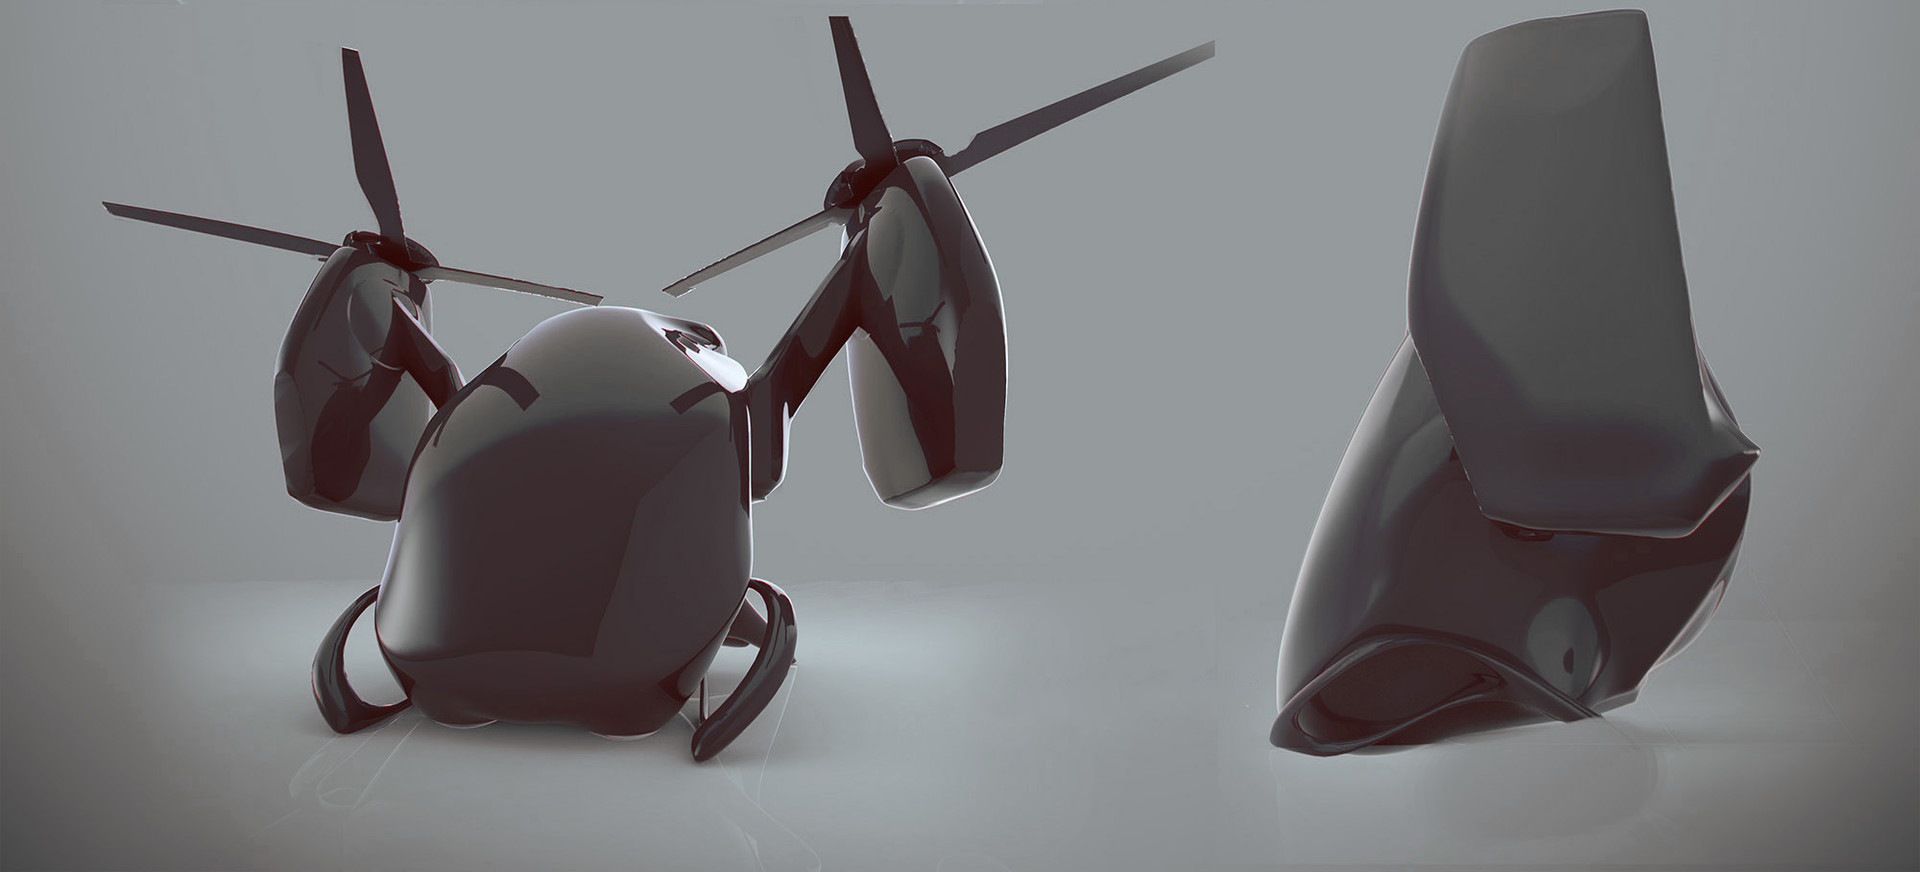 Yuriy romanyk promdisign helicopter scifi 3